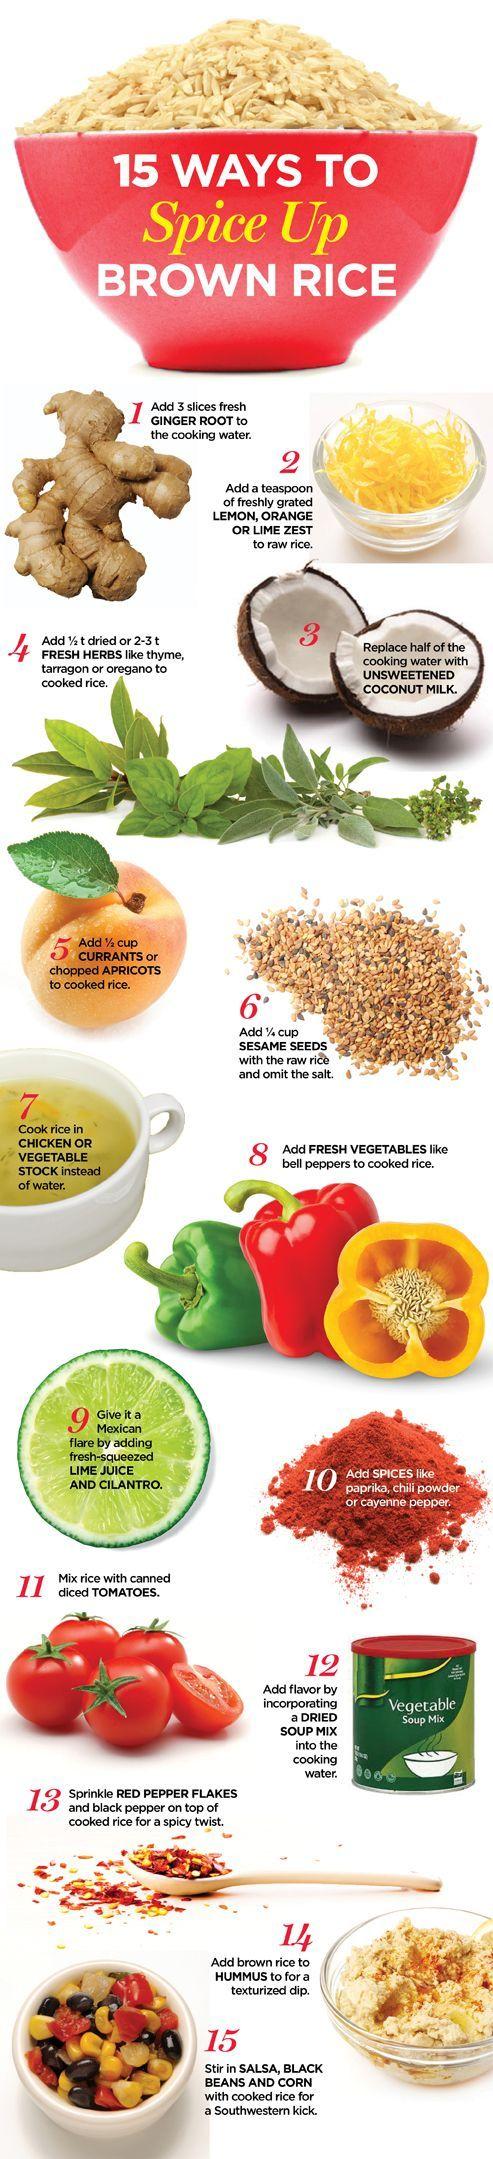 15 temperos para substituir o sal no arroz integral